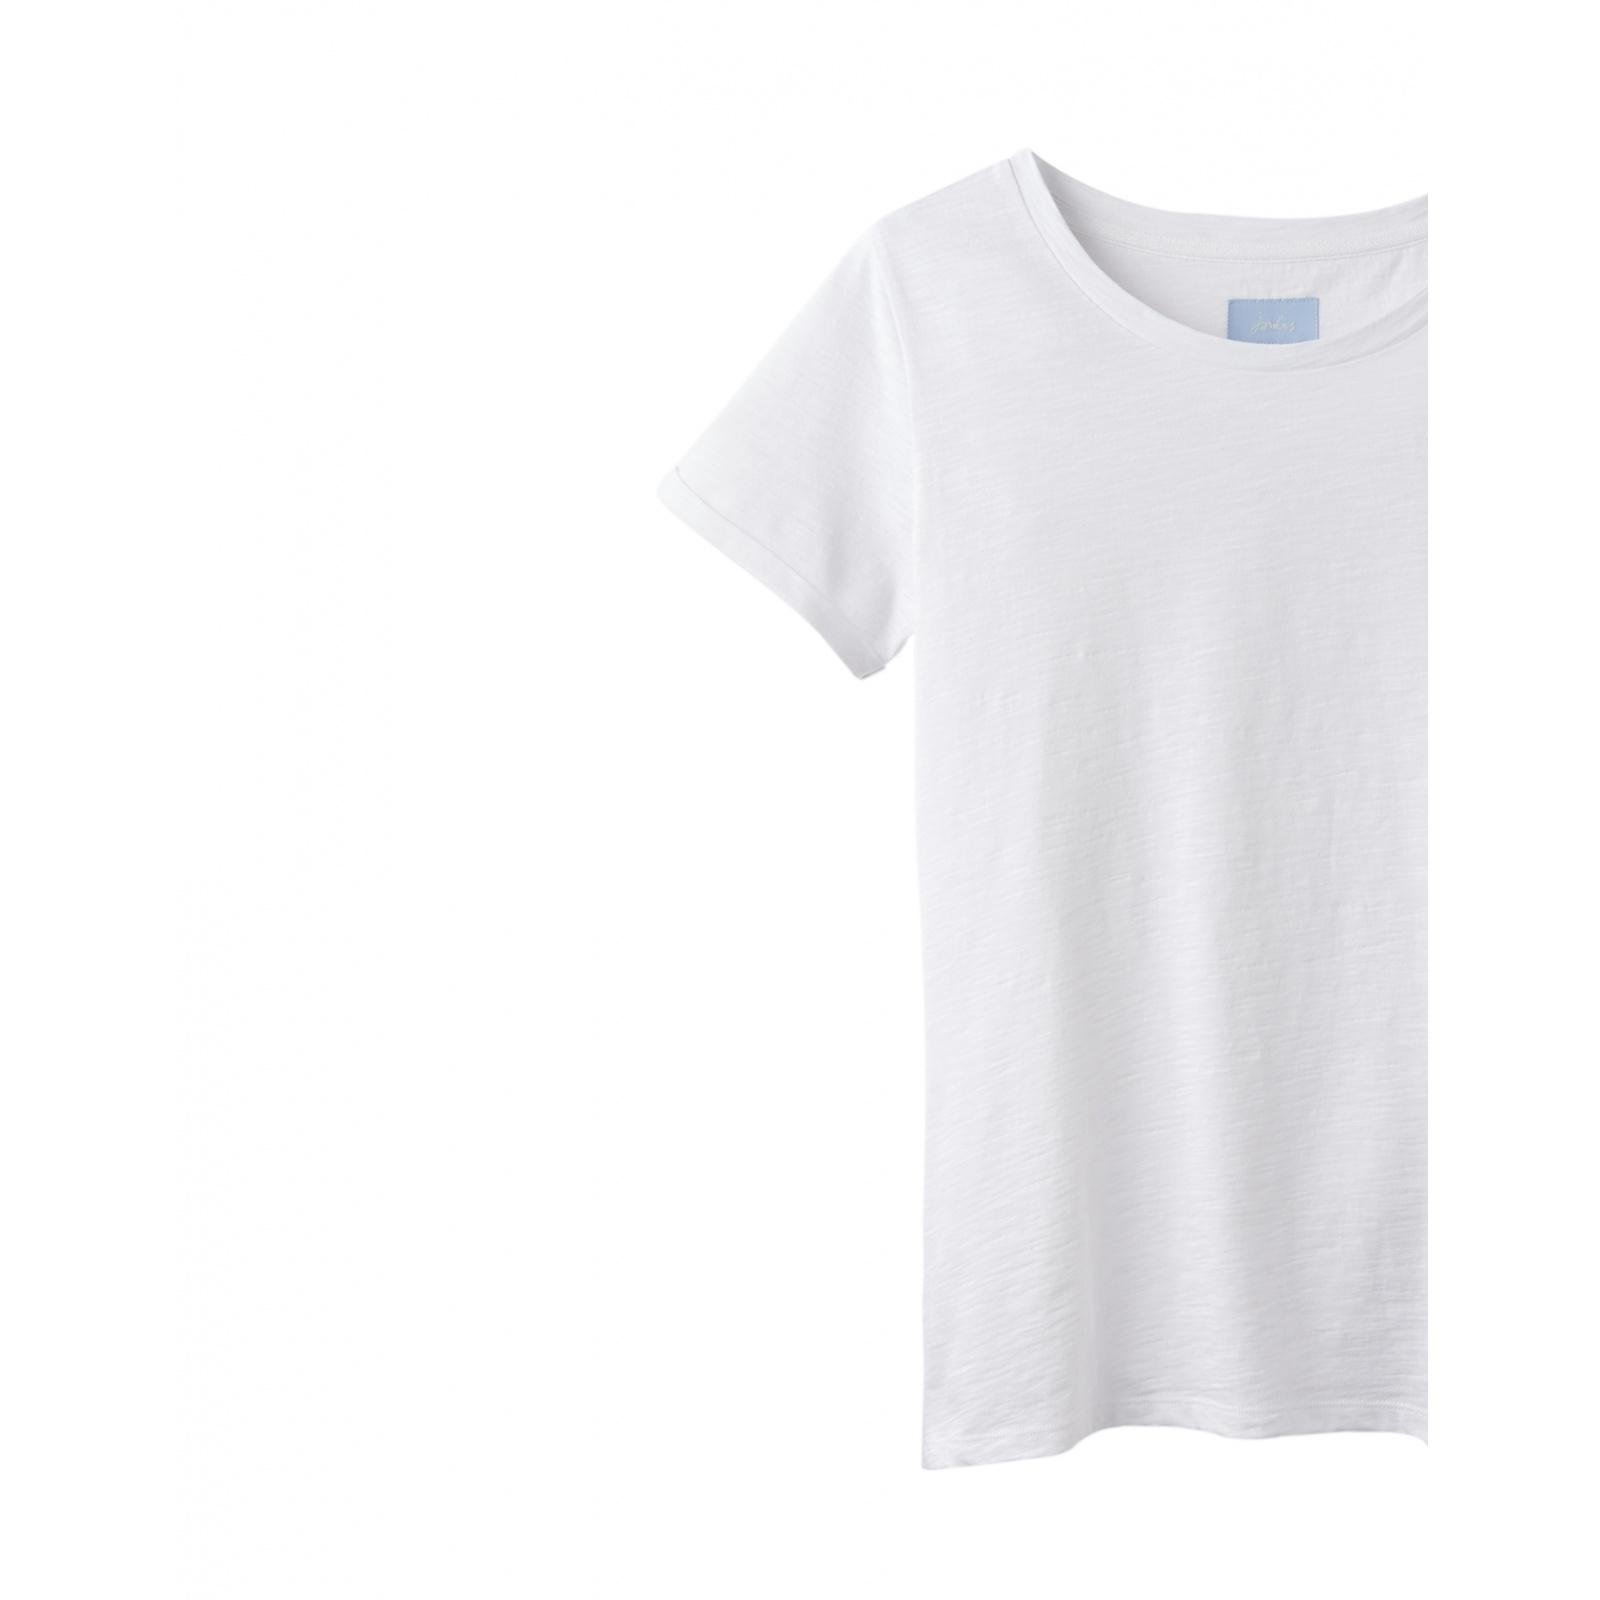 Joules-Nessa-ligero-Jersey-Camiseta-SS19 miniatura 13